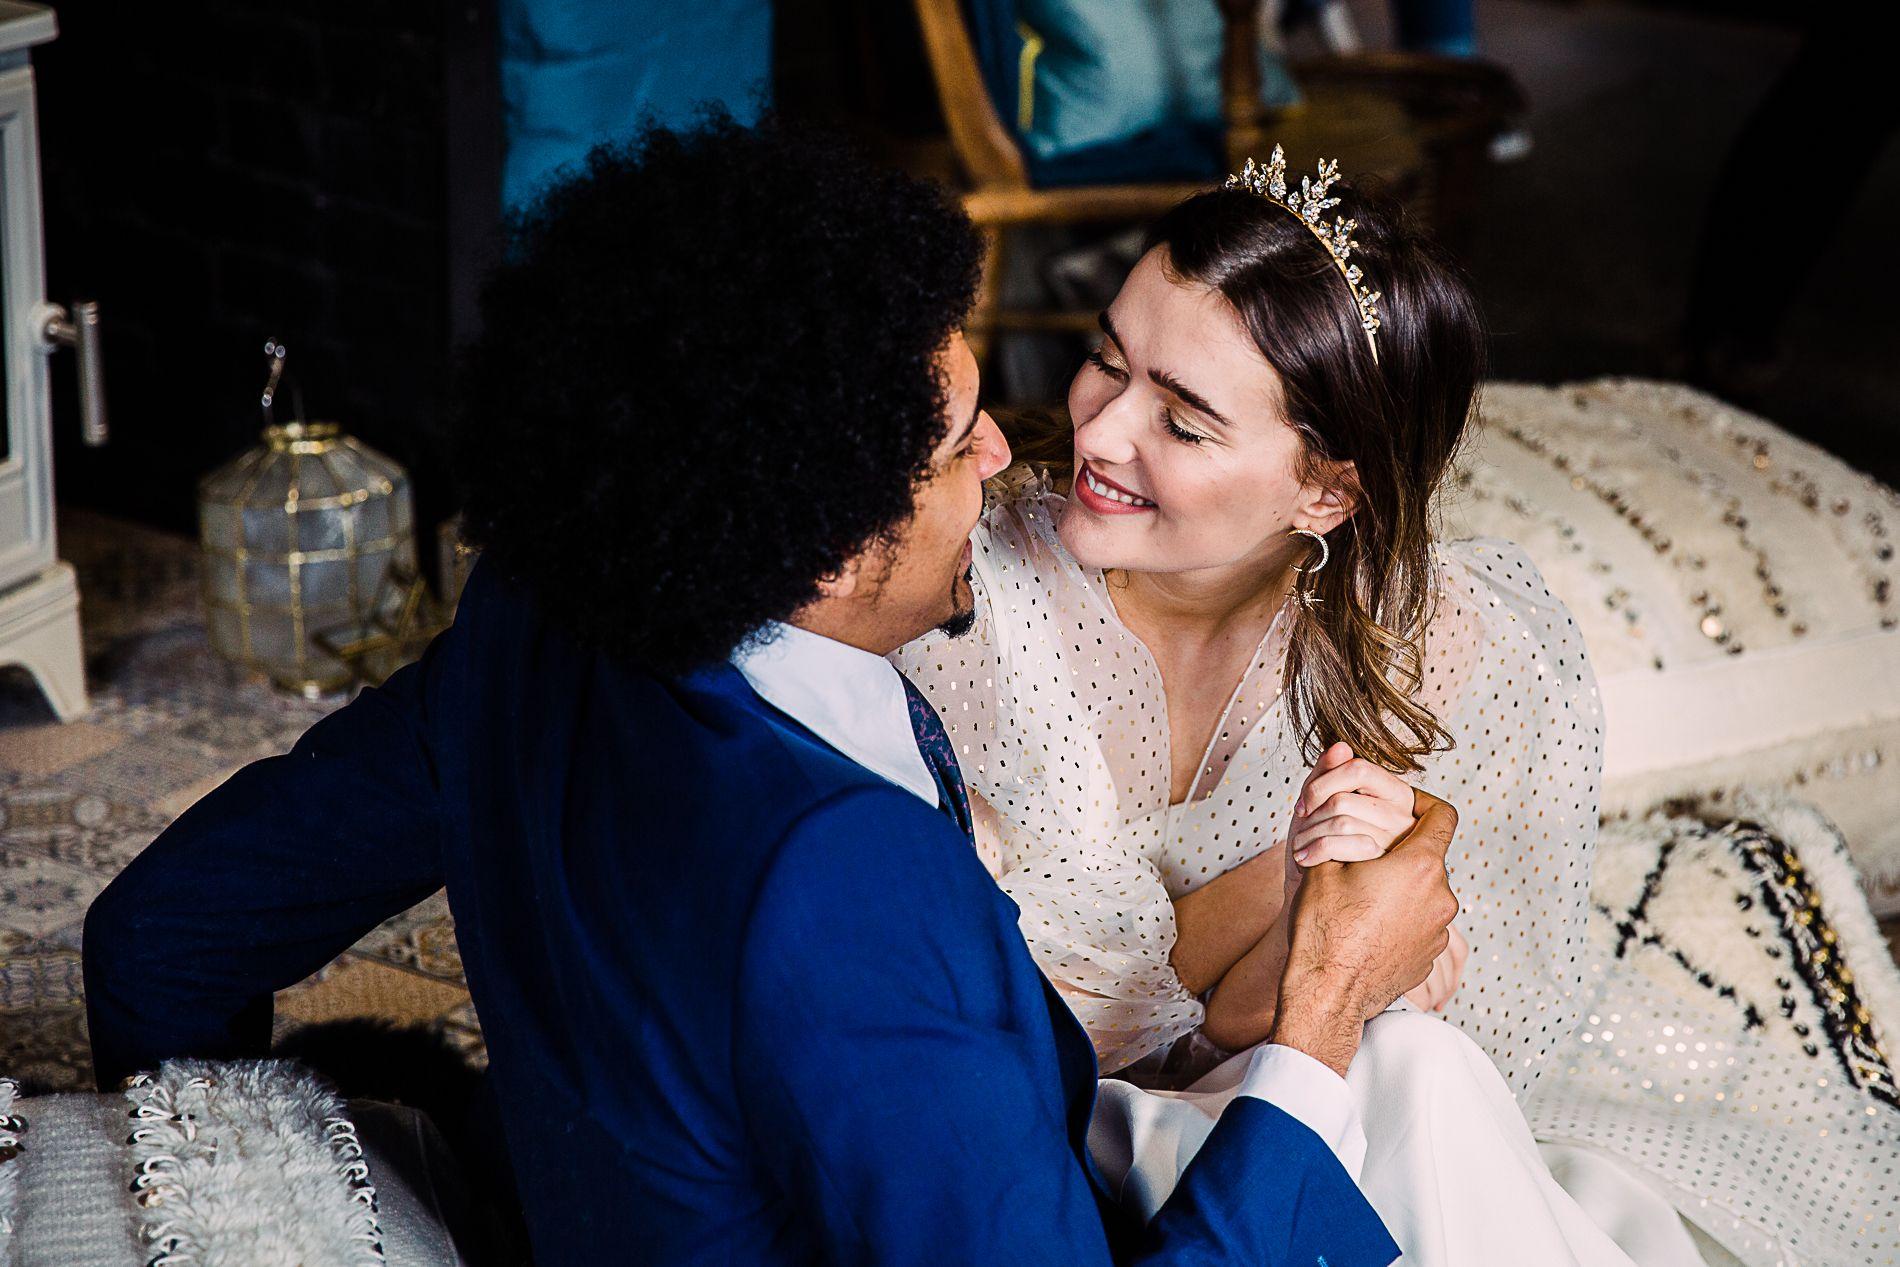 Wedding_Photography_Becky_Tranter-57.jpg